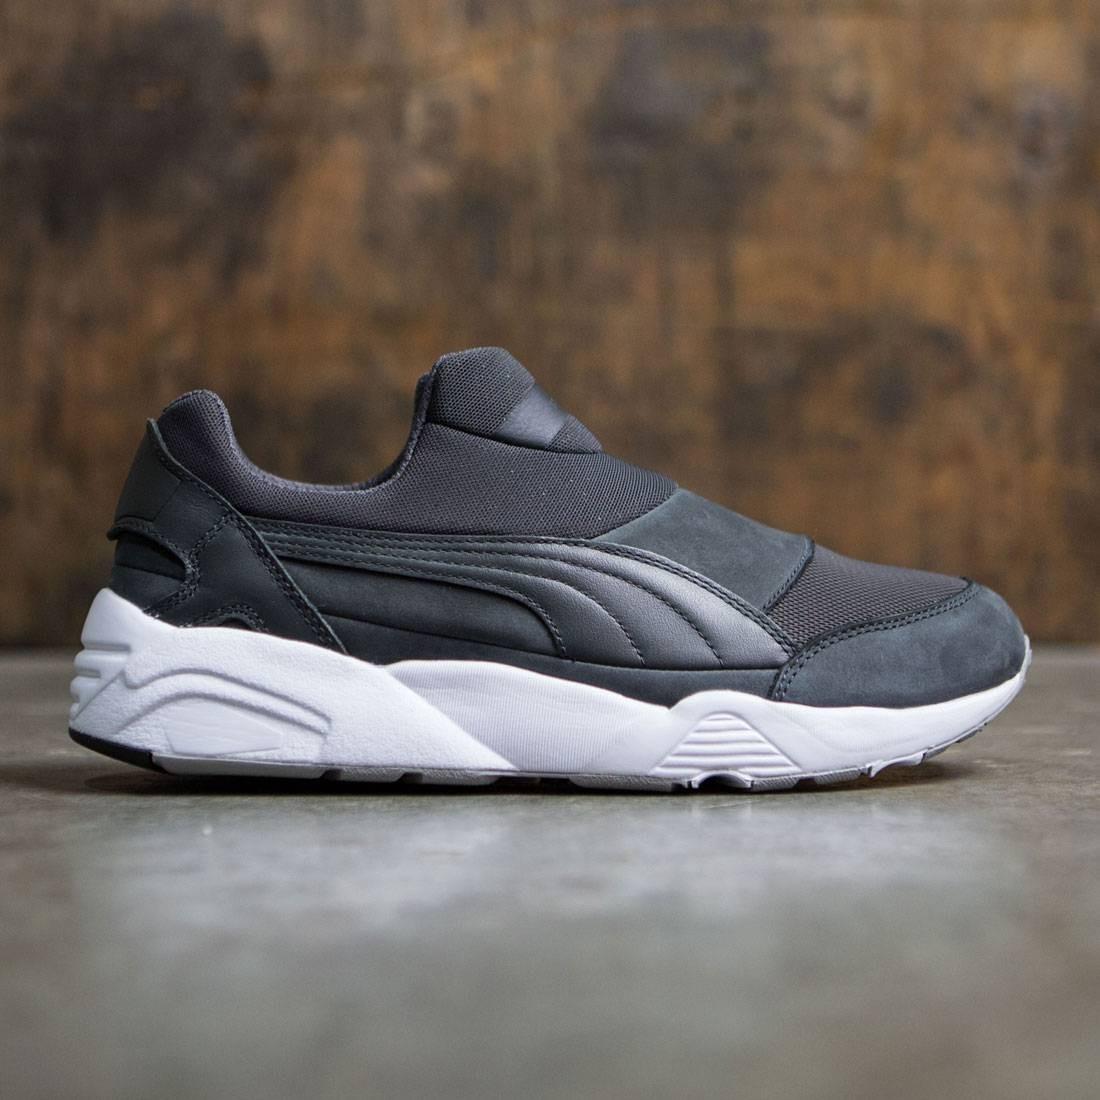 67a3784c1f67 Puma x Stampd Men Trinomic Sock gray asphault white